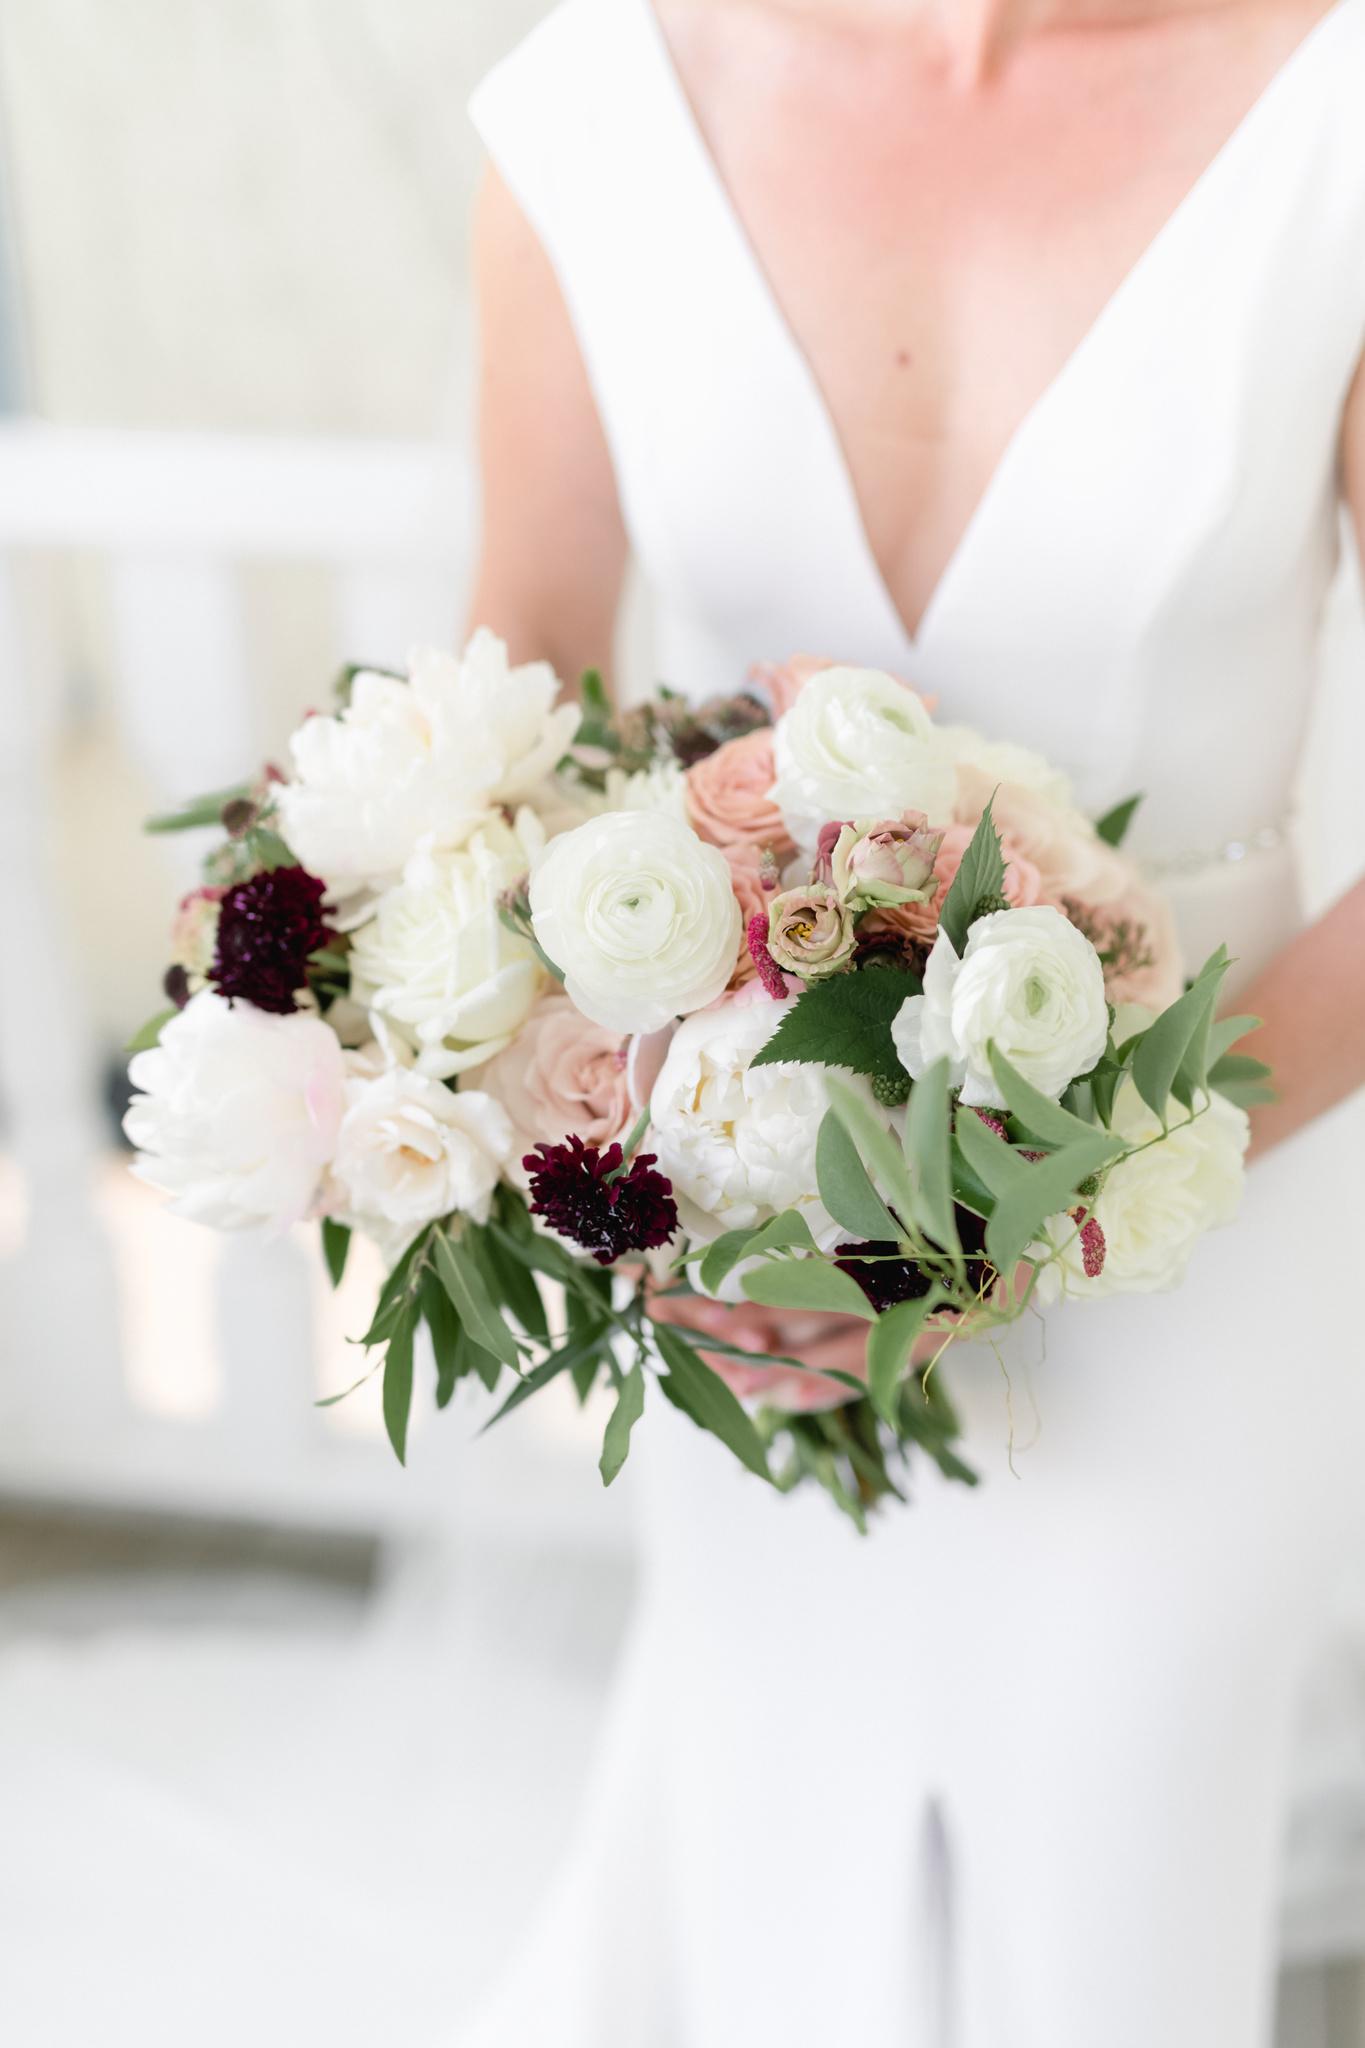 blush floral_wedding bouquets__ct wedding_ct wedding photographer-1.jpg